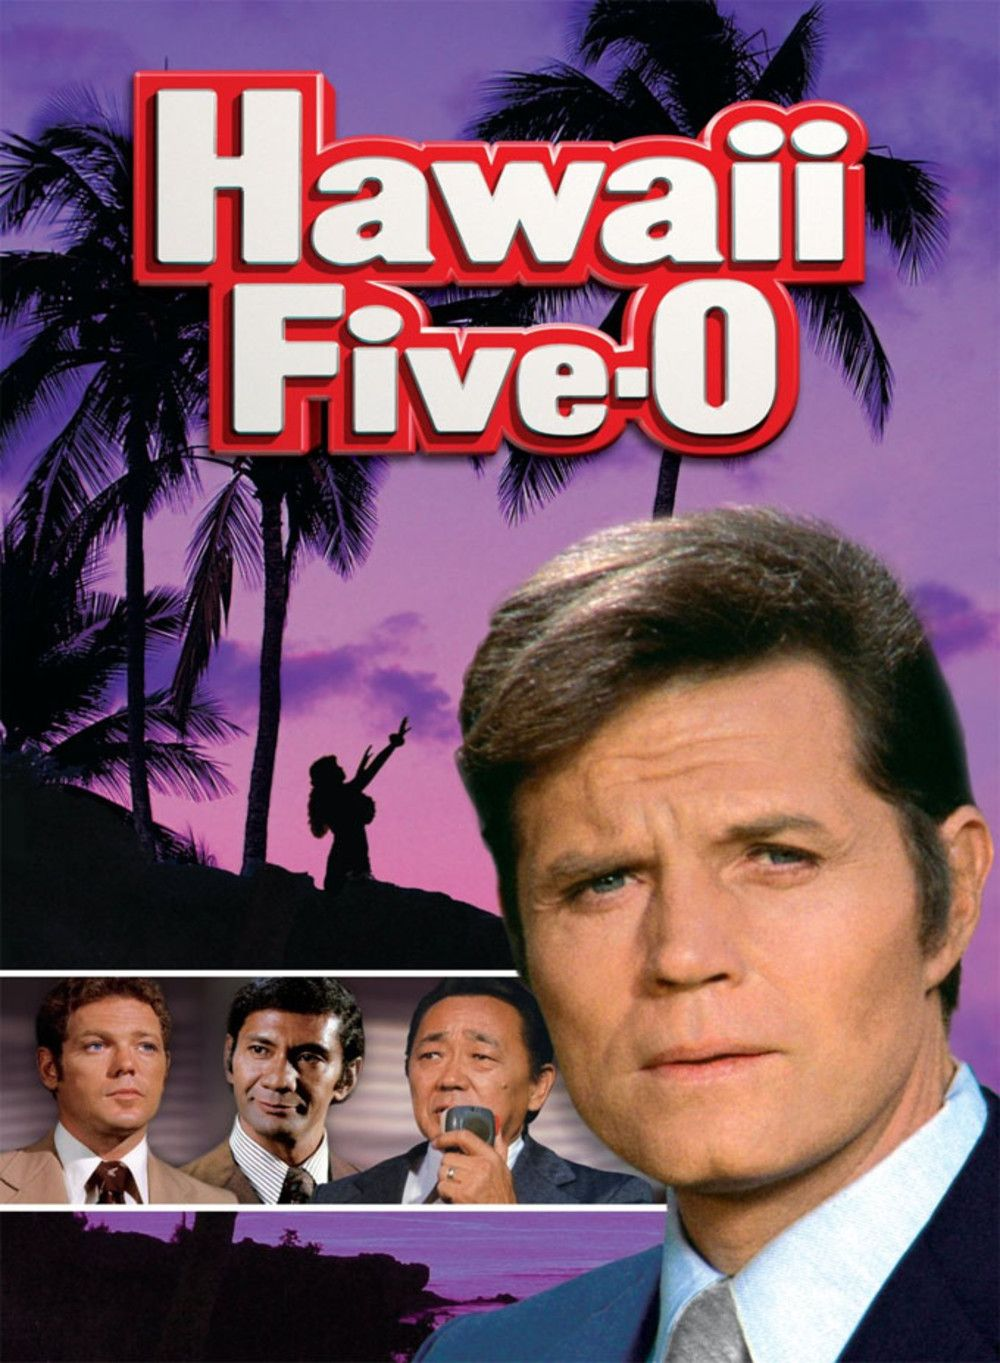 Hawai Police D Etat : hawai, police, Hawaï, Police, D'État, (Hawaii, Five-O), Série, Télévisée, Américaine,, épisodes, Minutes,, Créée, Leonard, Freeman, Hawaii, Series